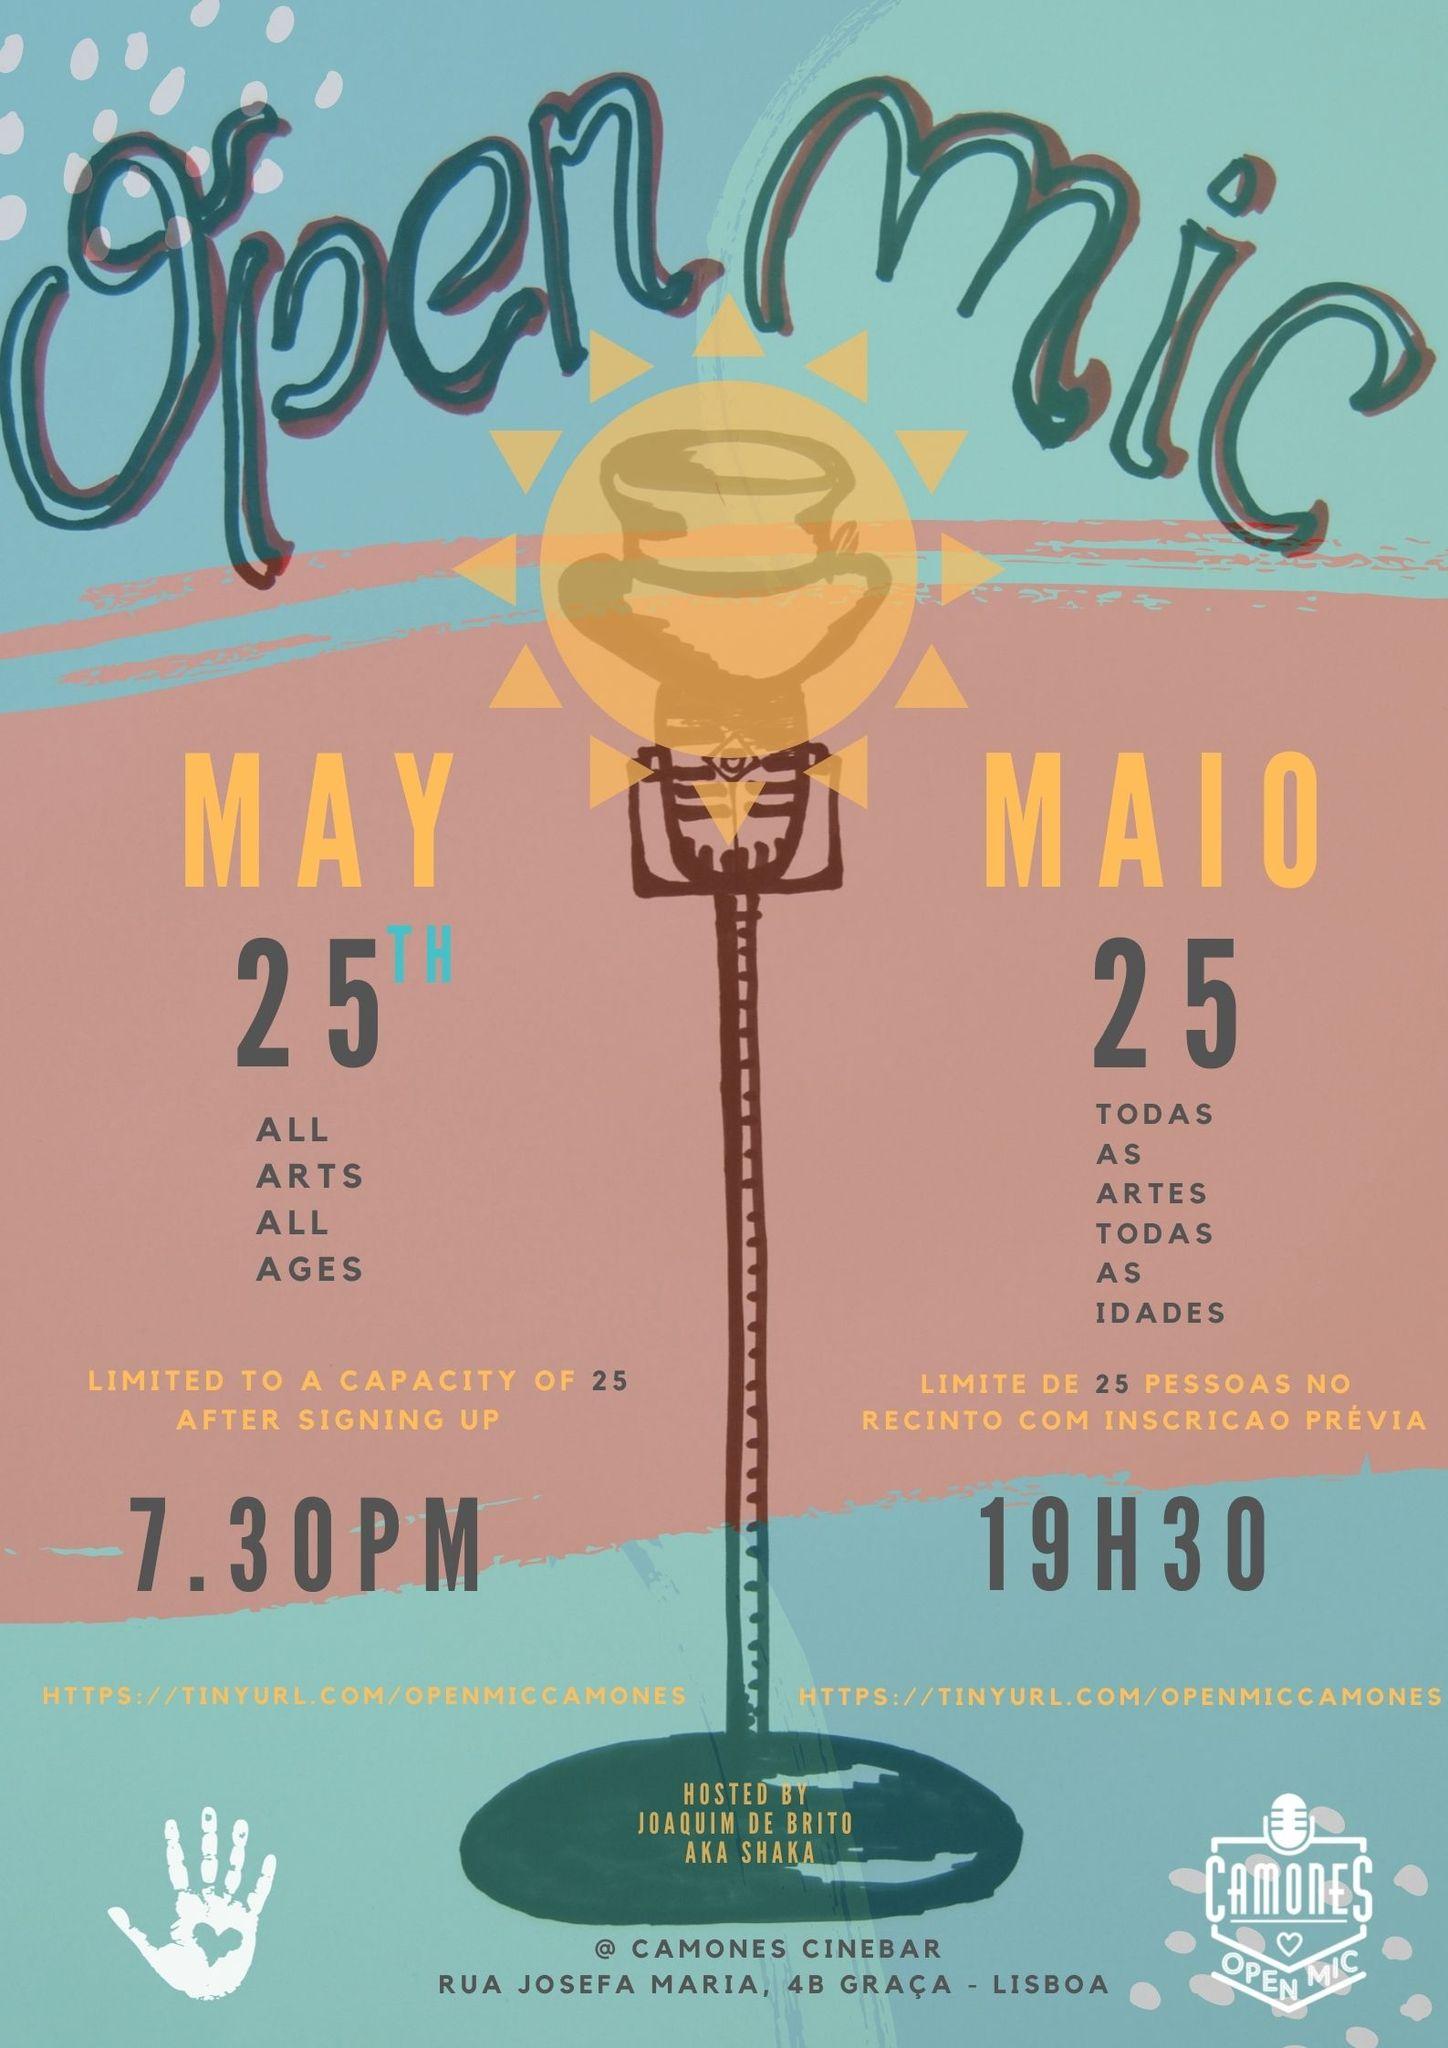 Open Mic - 68ª edição - All Arts, All Ages